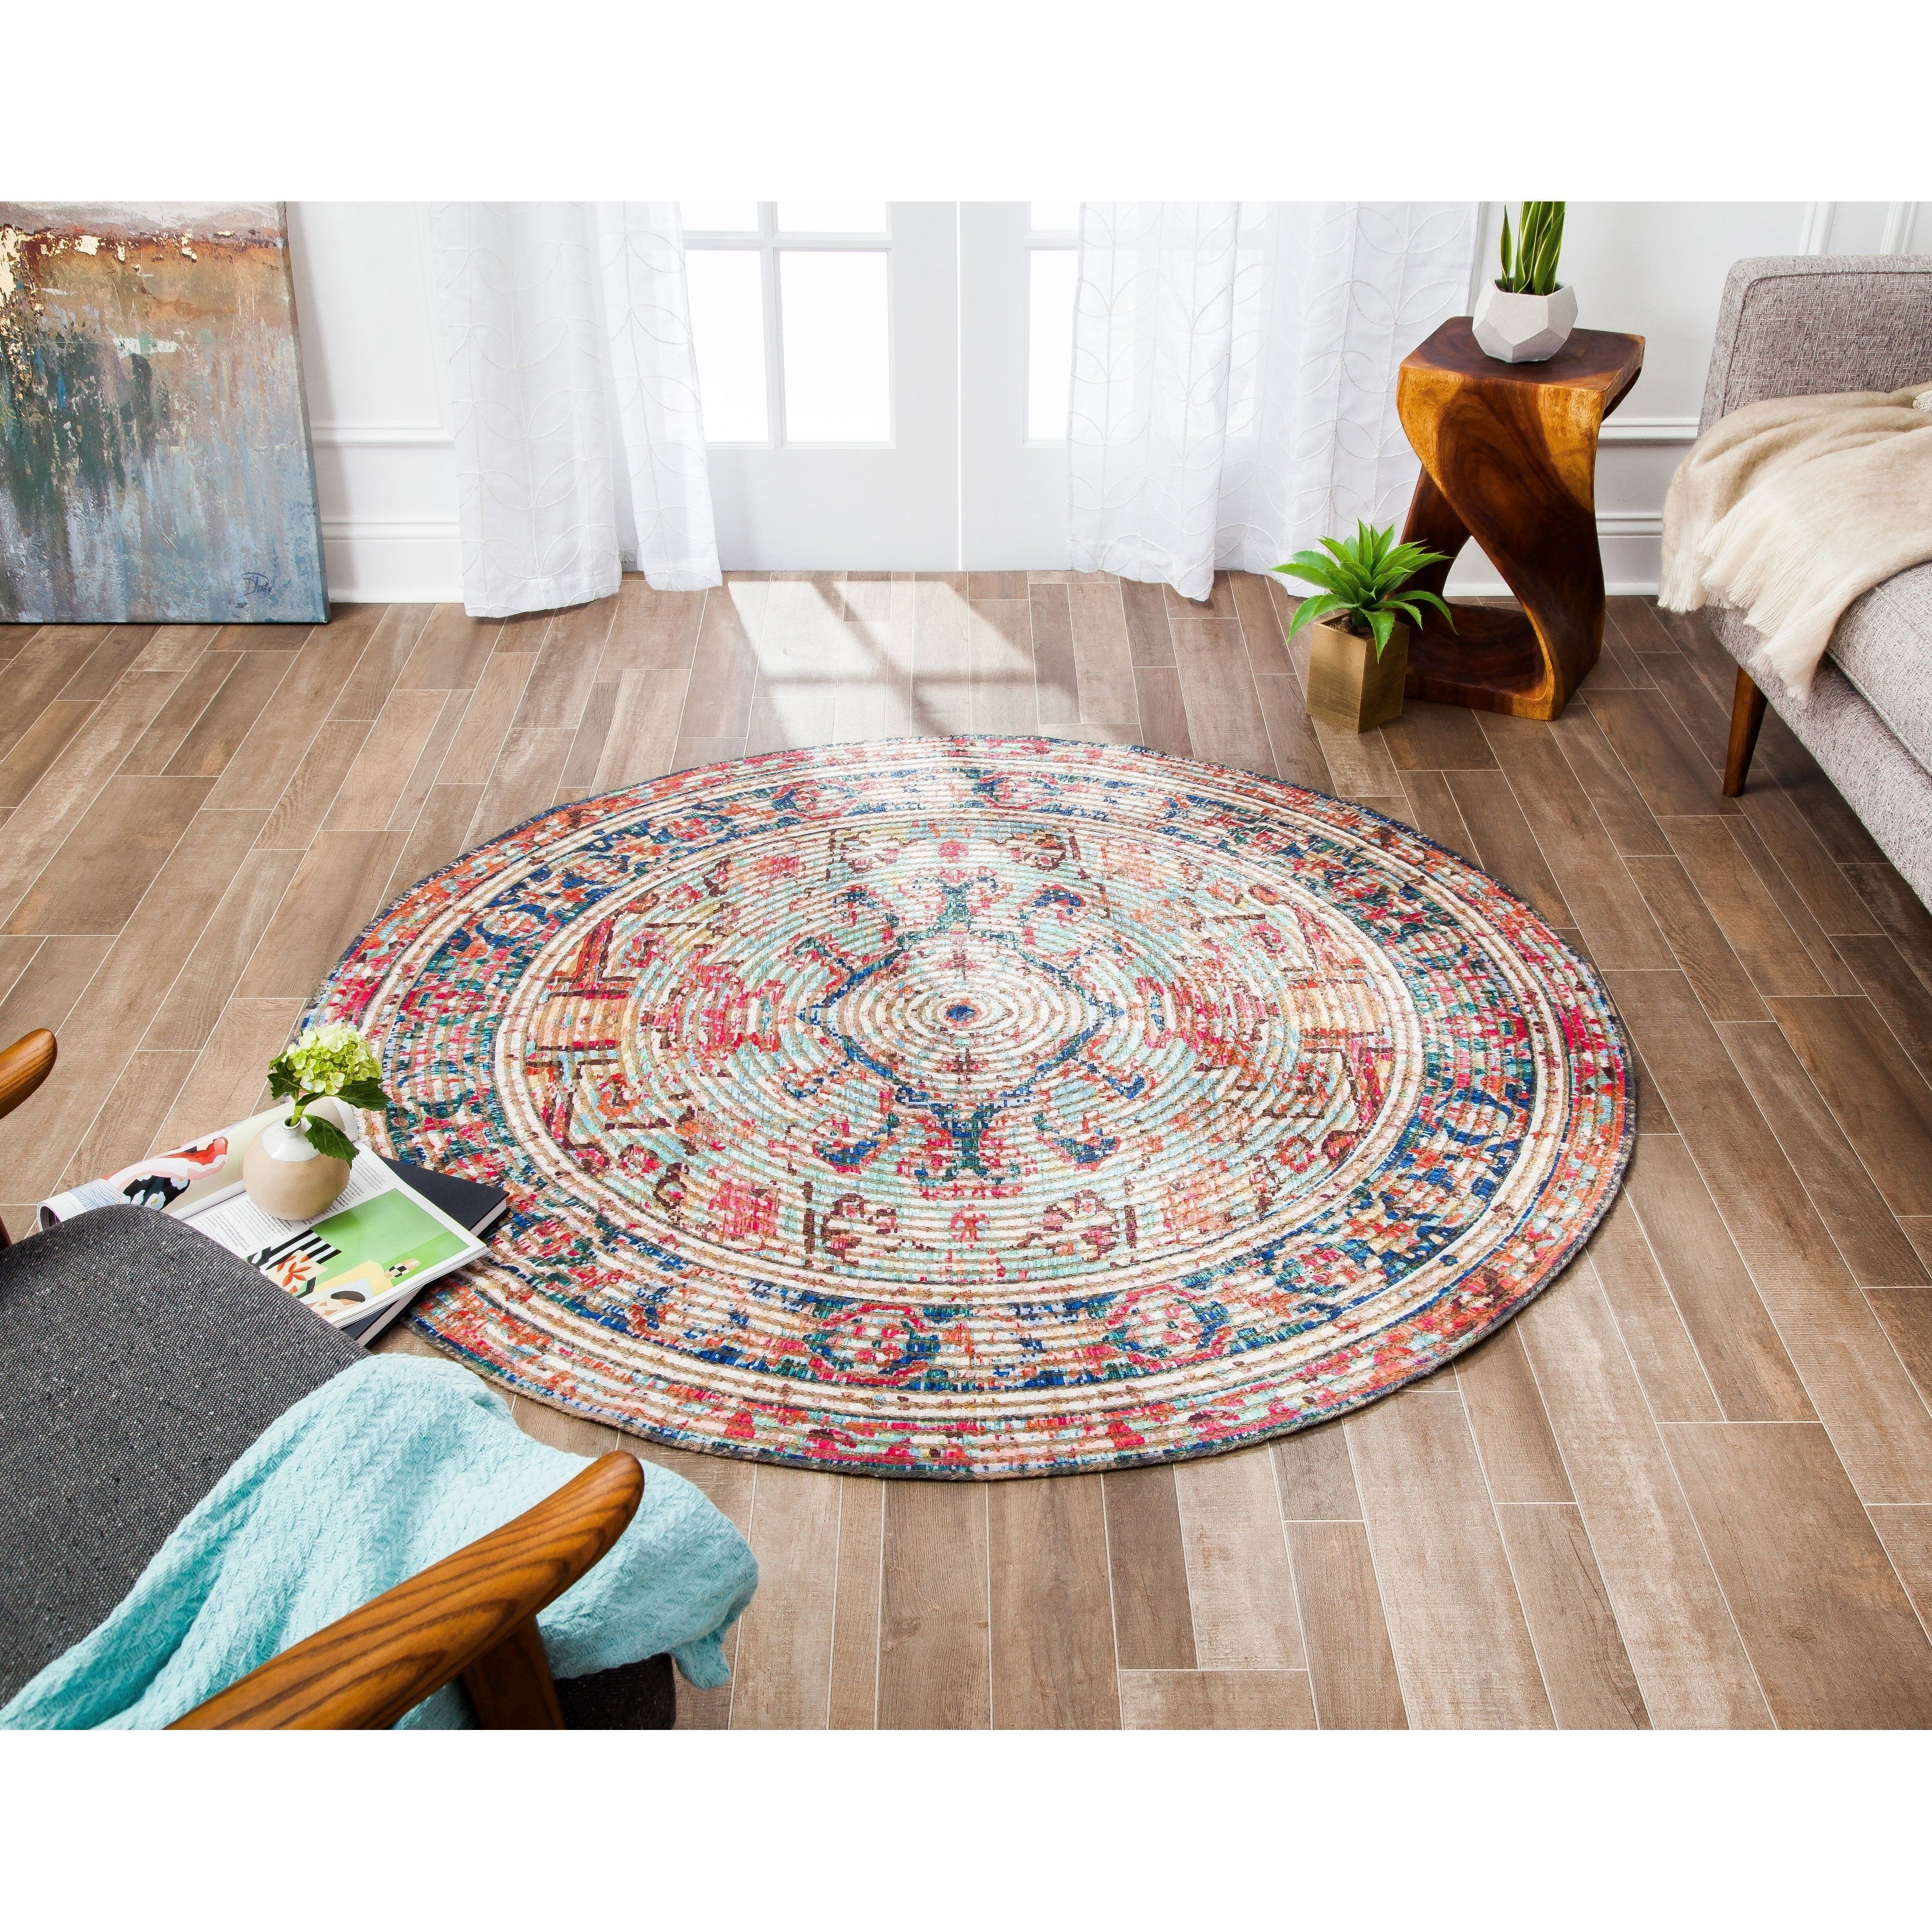 Jani Calo Distressed Red Jute Blend Rug 8 Blue Cotton Geometric Area Rugs Jute Area Rugs Antique Persian Carpet